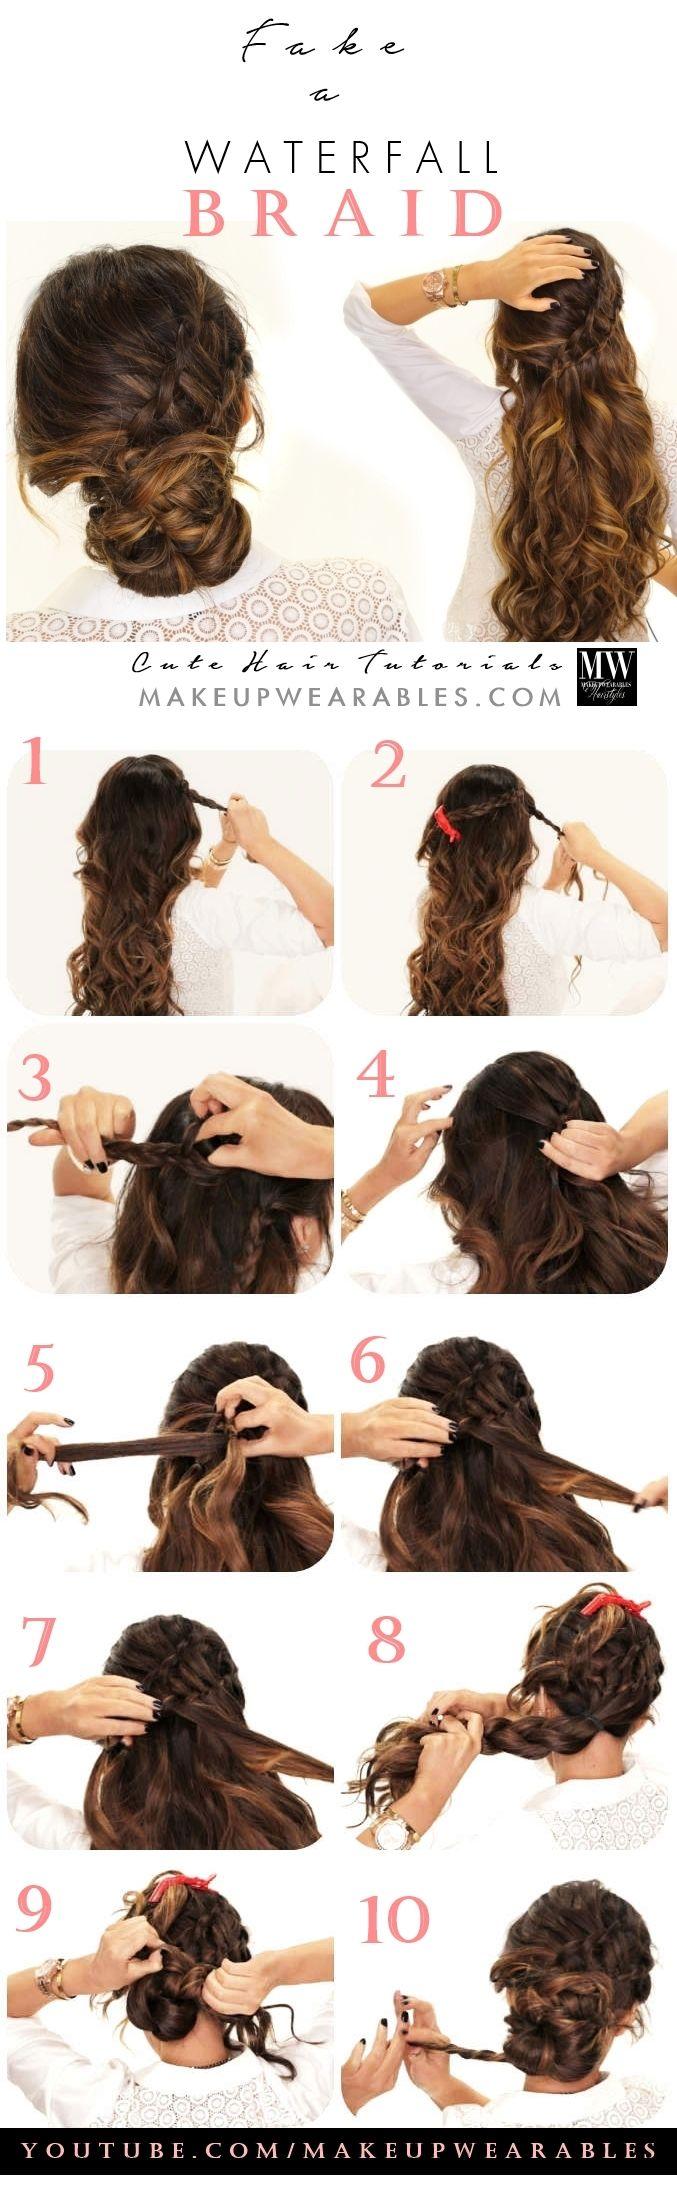 Fake Waterfall Ladder Braid Half-Updo + Bun Hairstyle | Hair tutorial